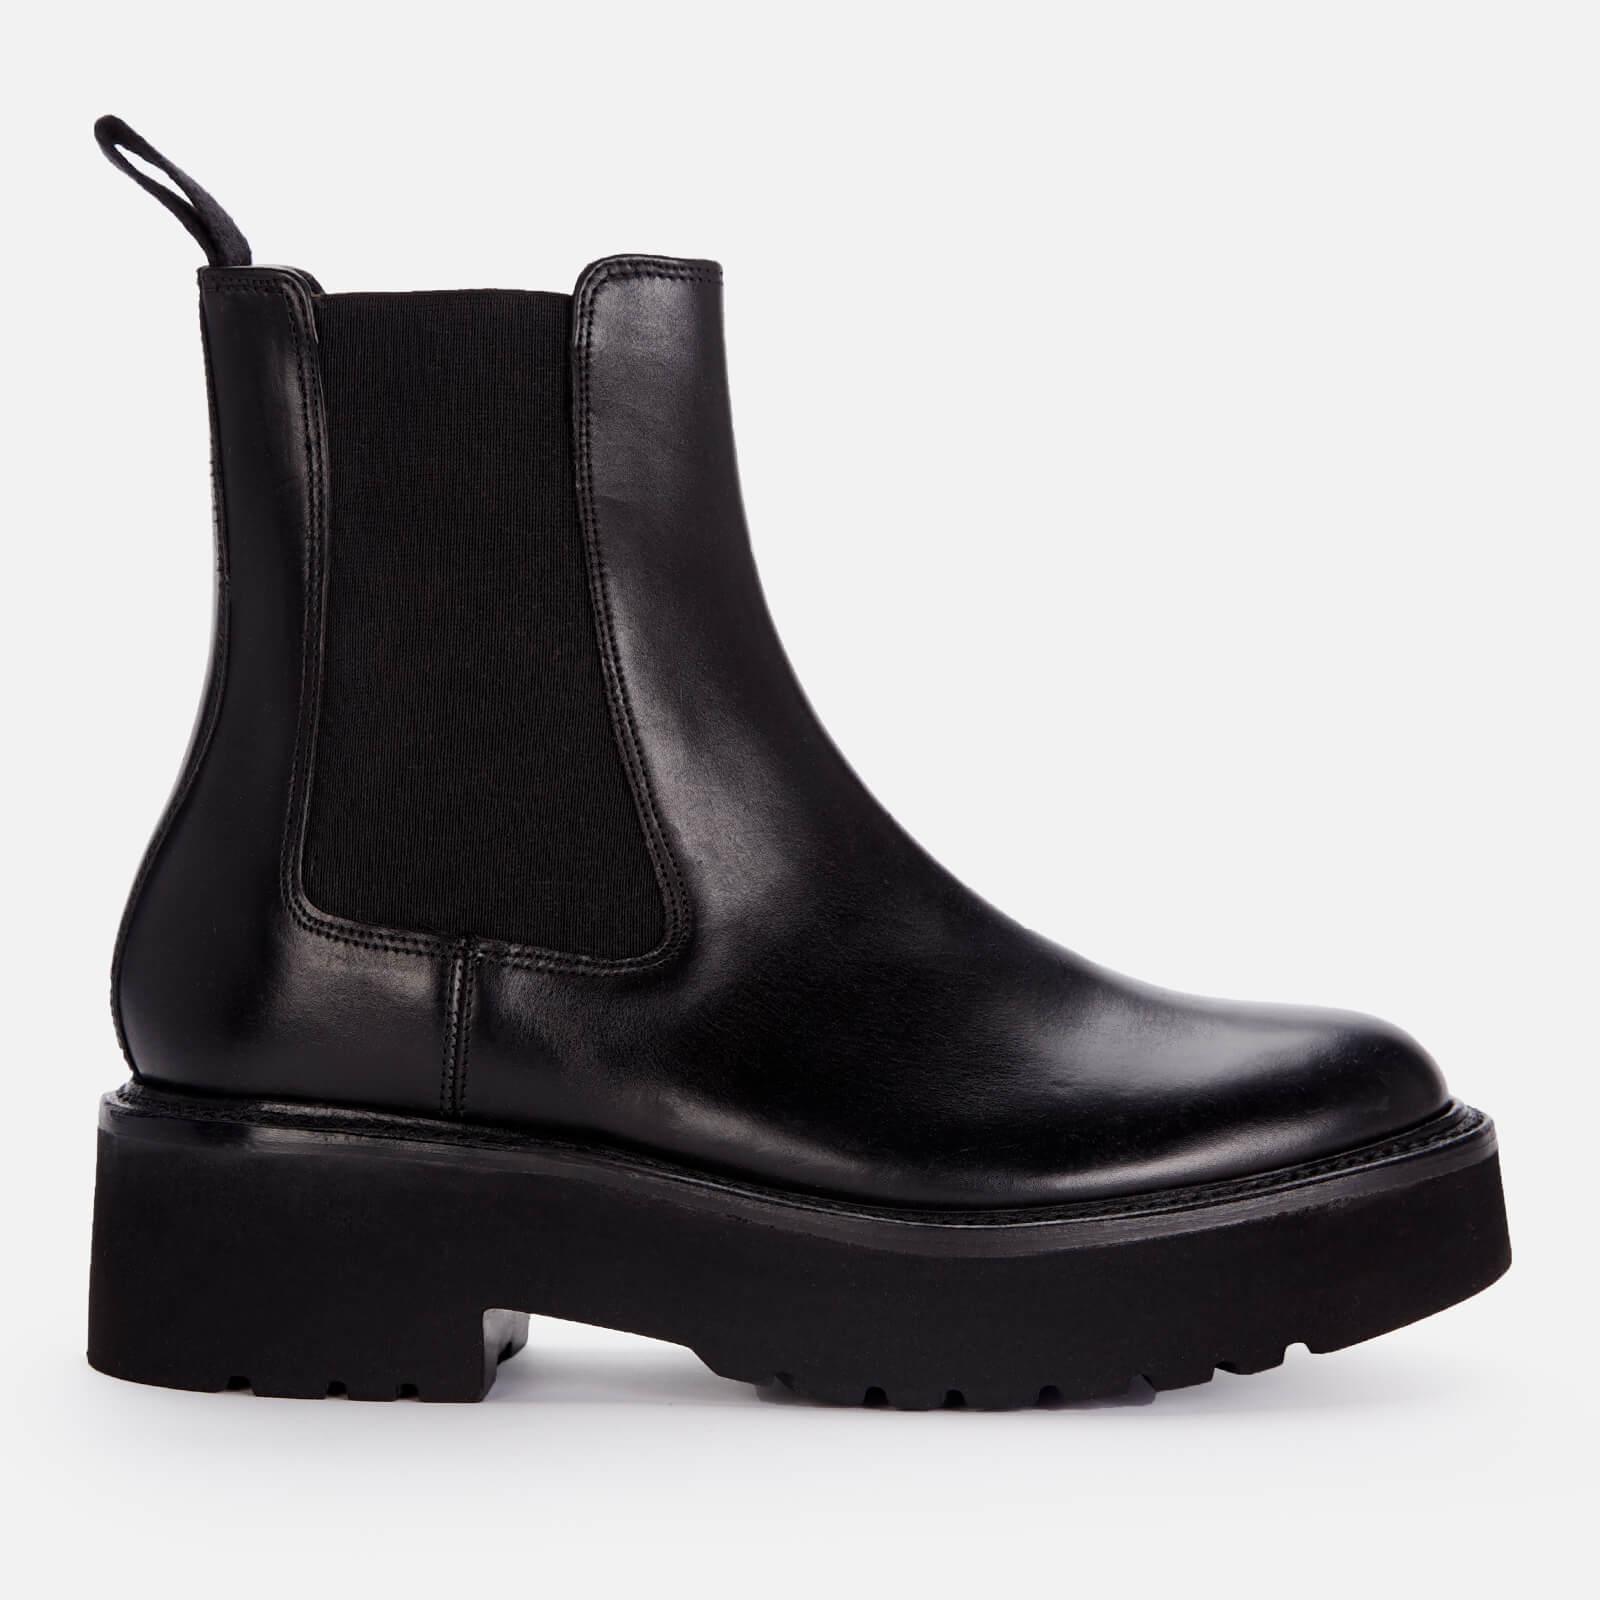 Grenson Women's Nova Leather Chelsea Boots - Black - UK 3